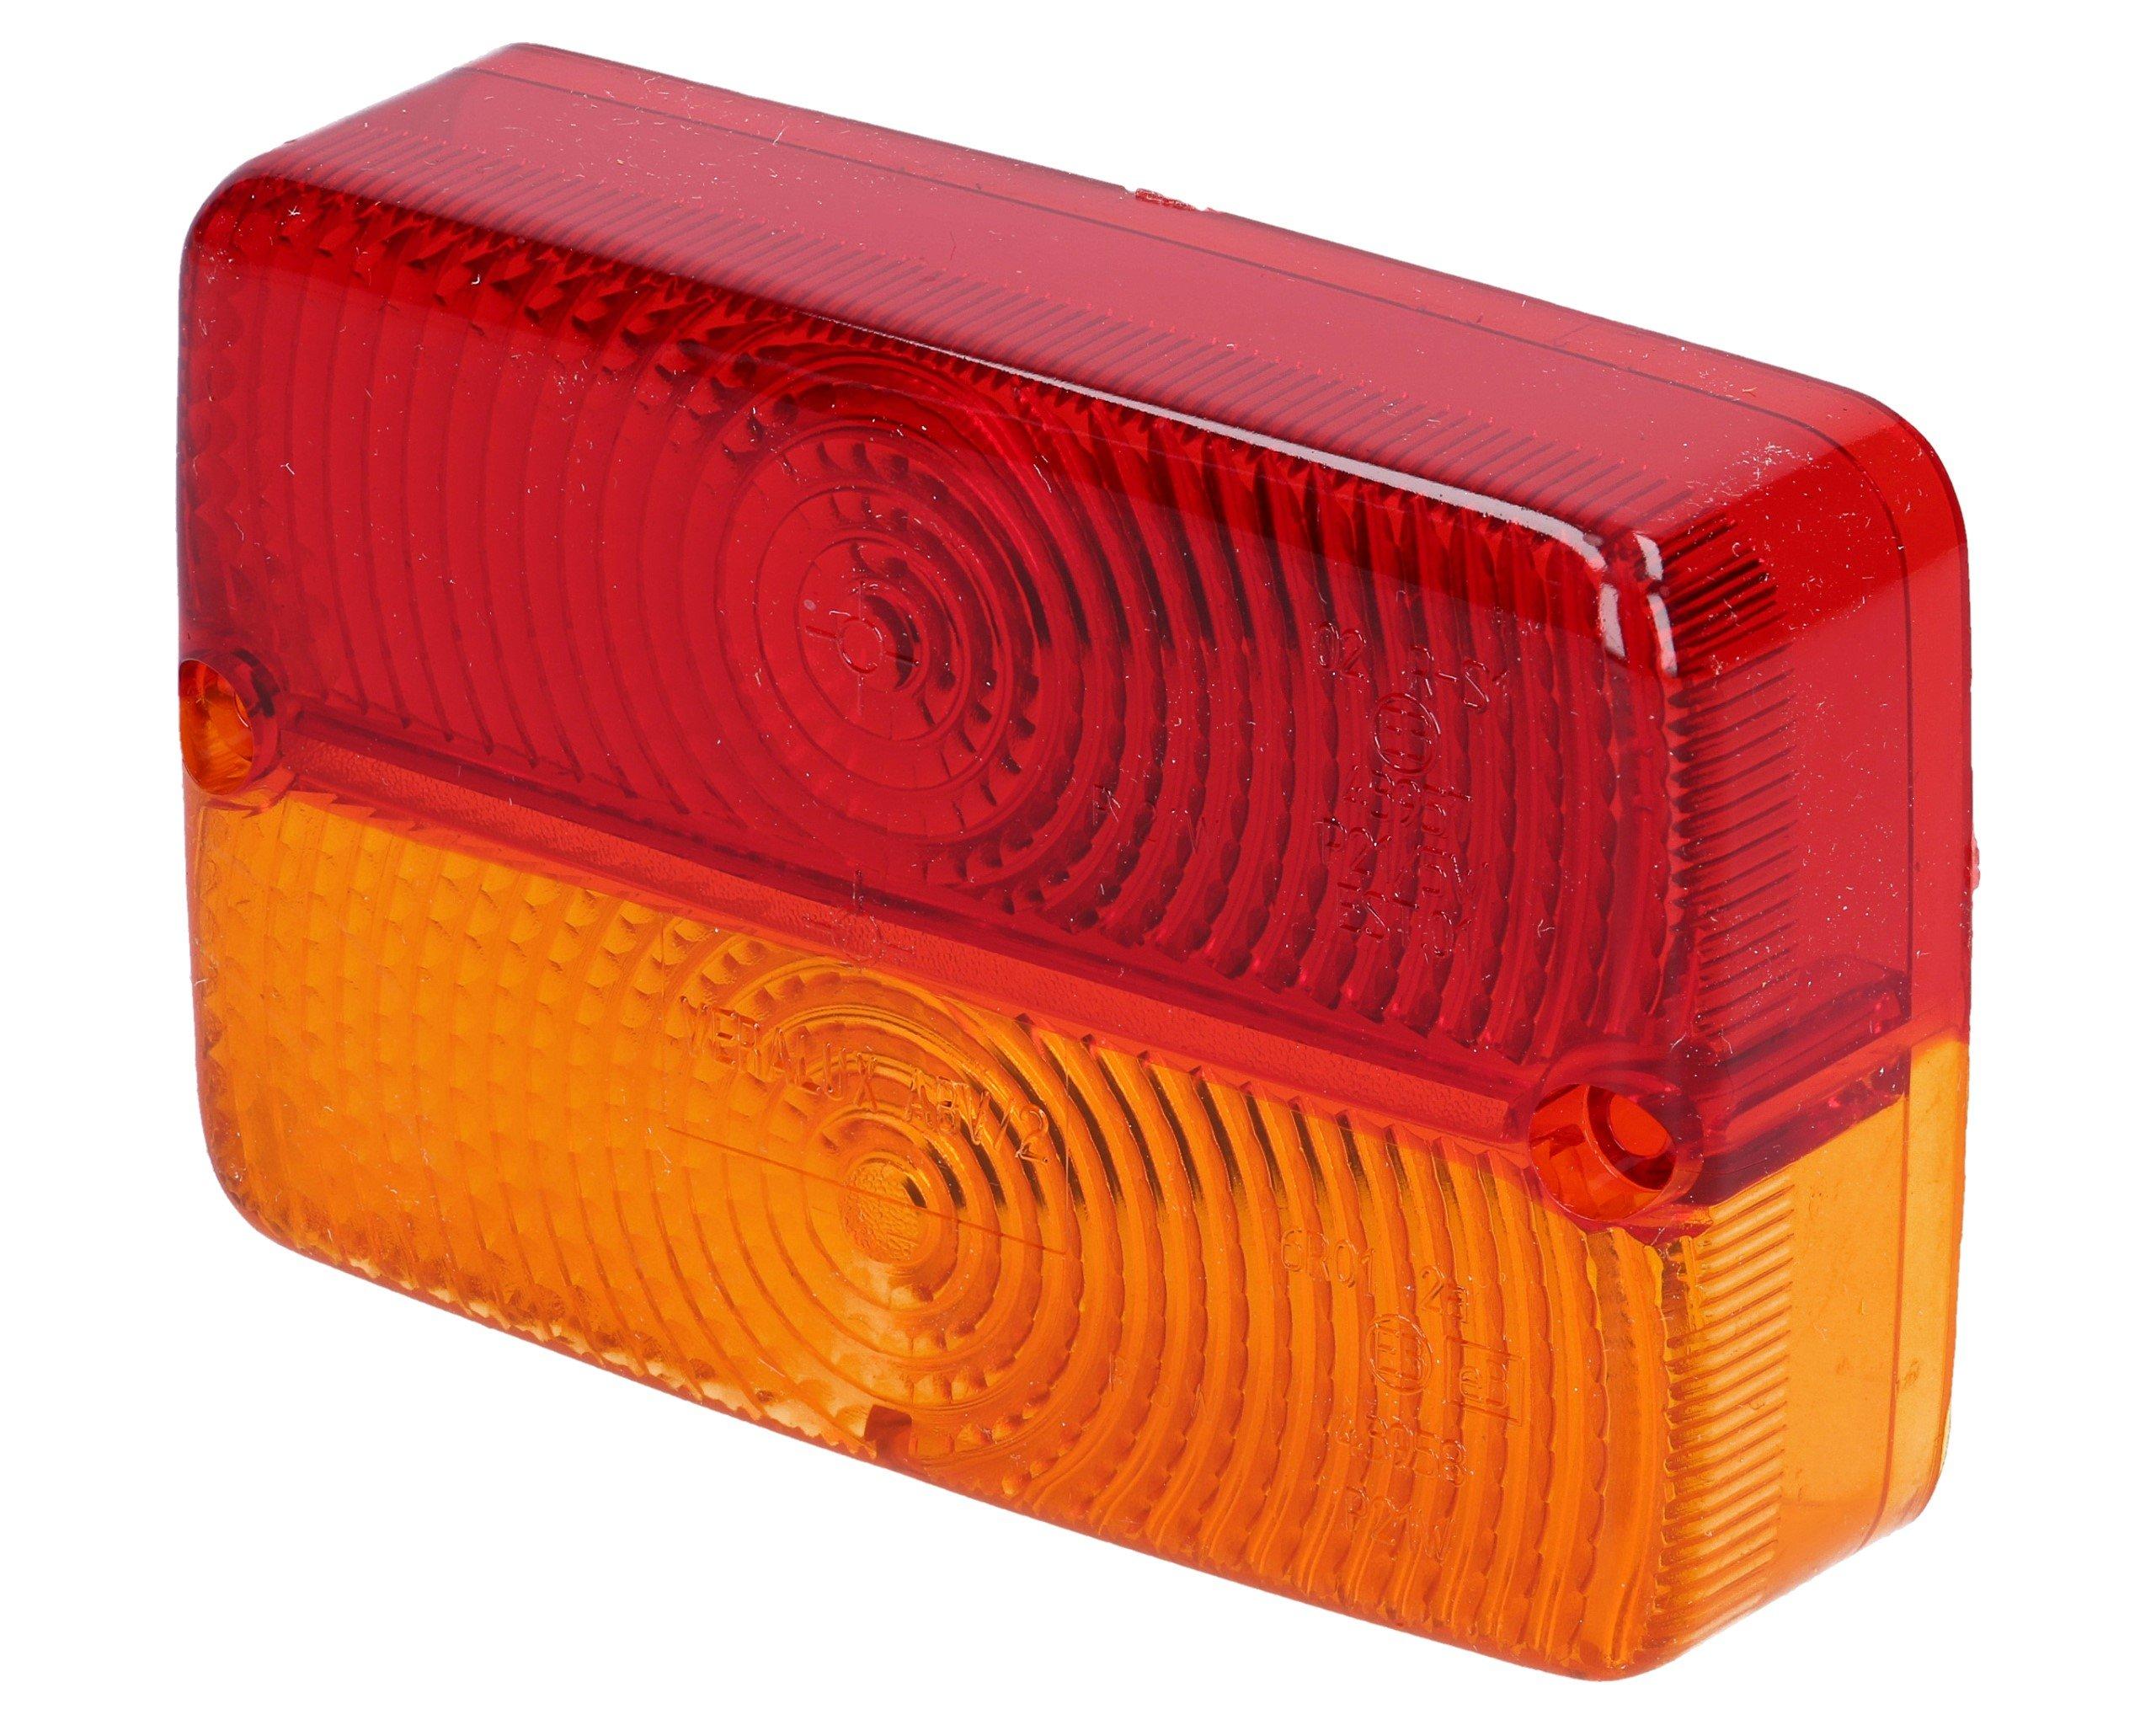 klosz lampy tylnej COBO Claas, Deutz Fahr, Renault 04414104, 6001143030, 6005001584